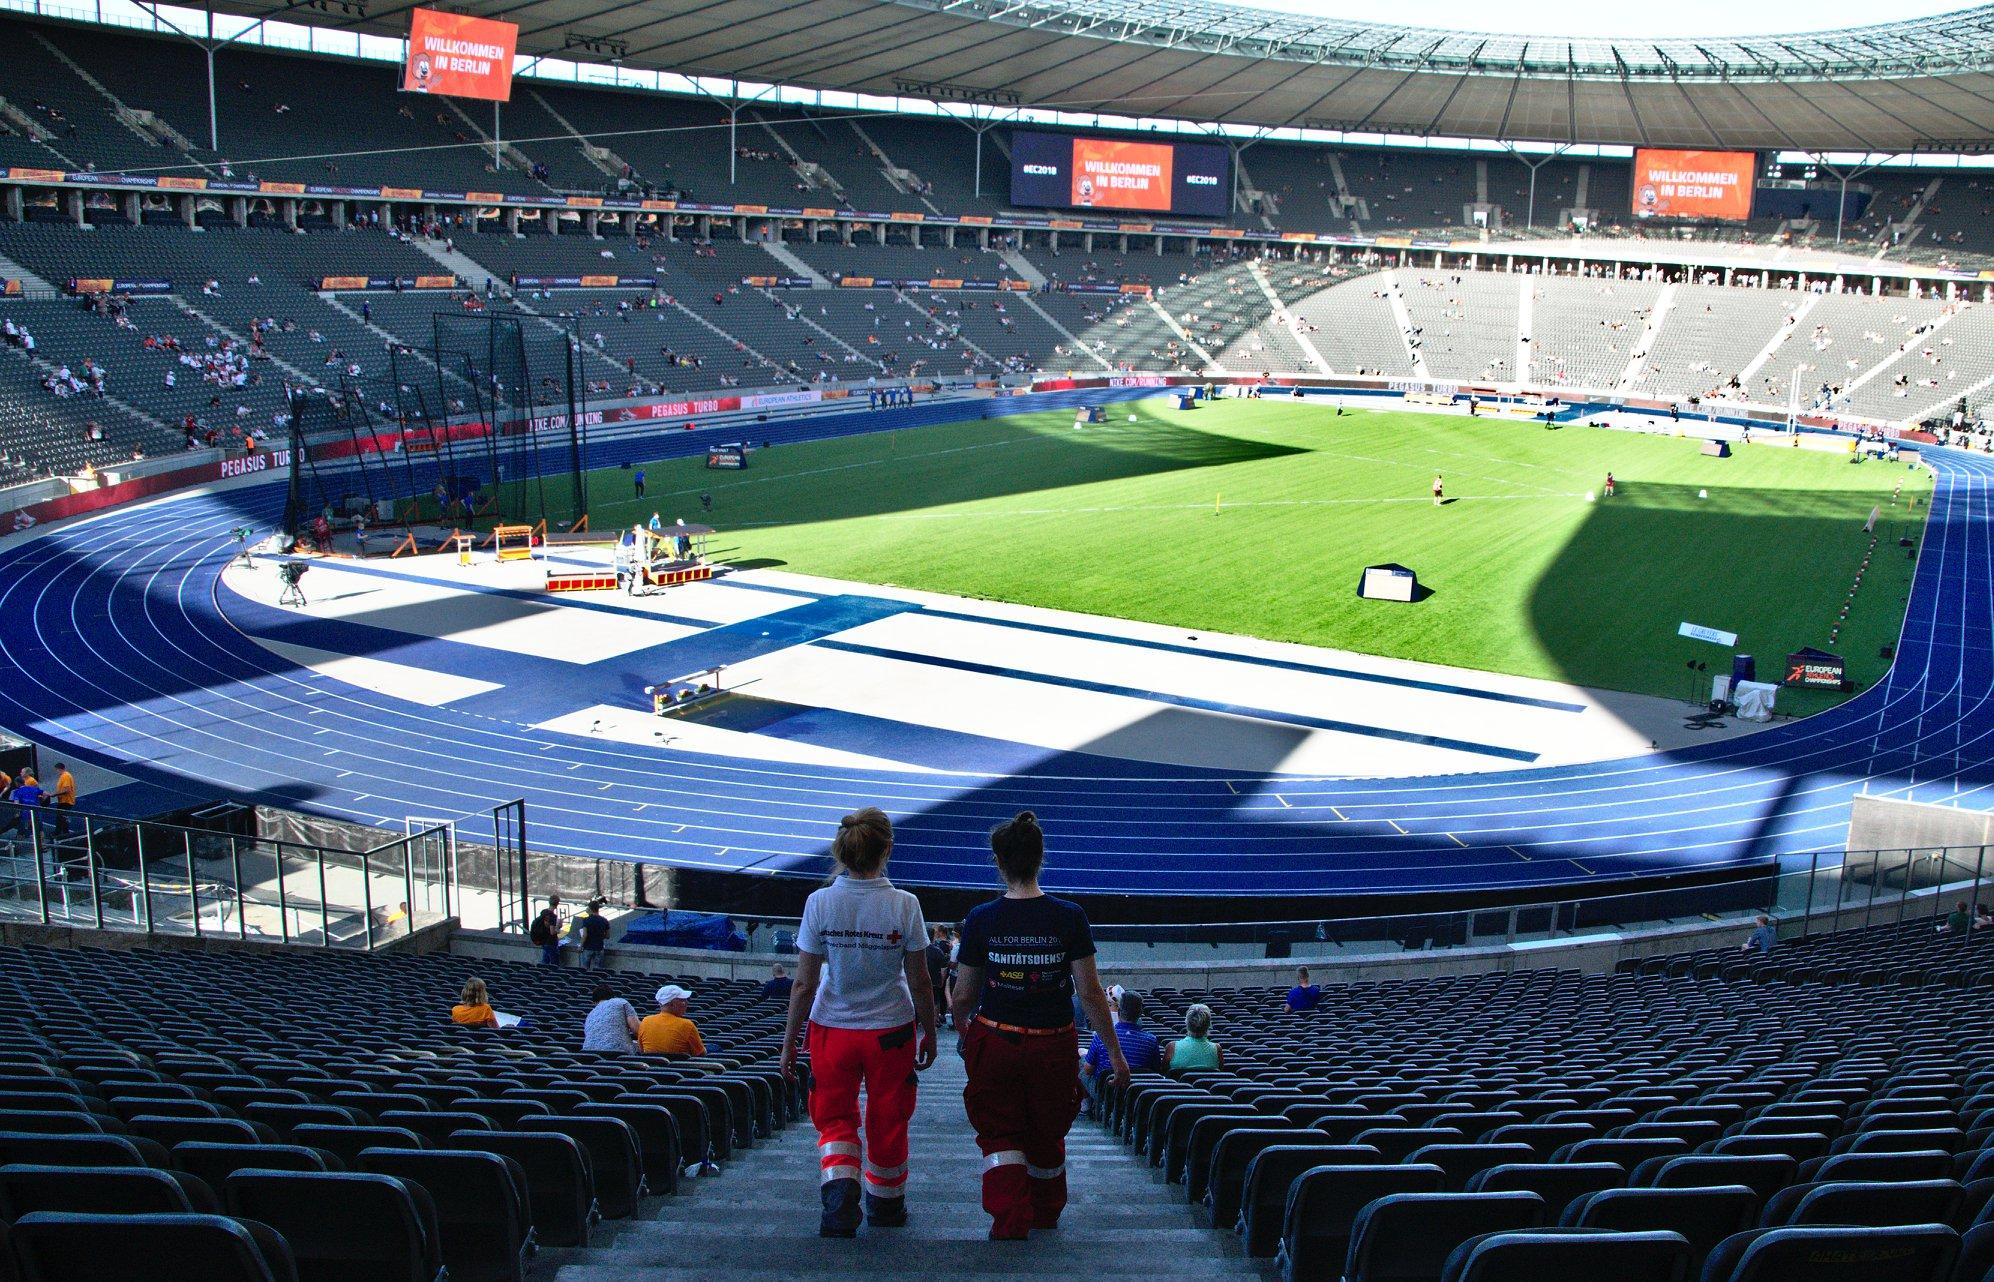 Zu Gast im Olympiastadion Berlin!